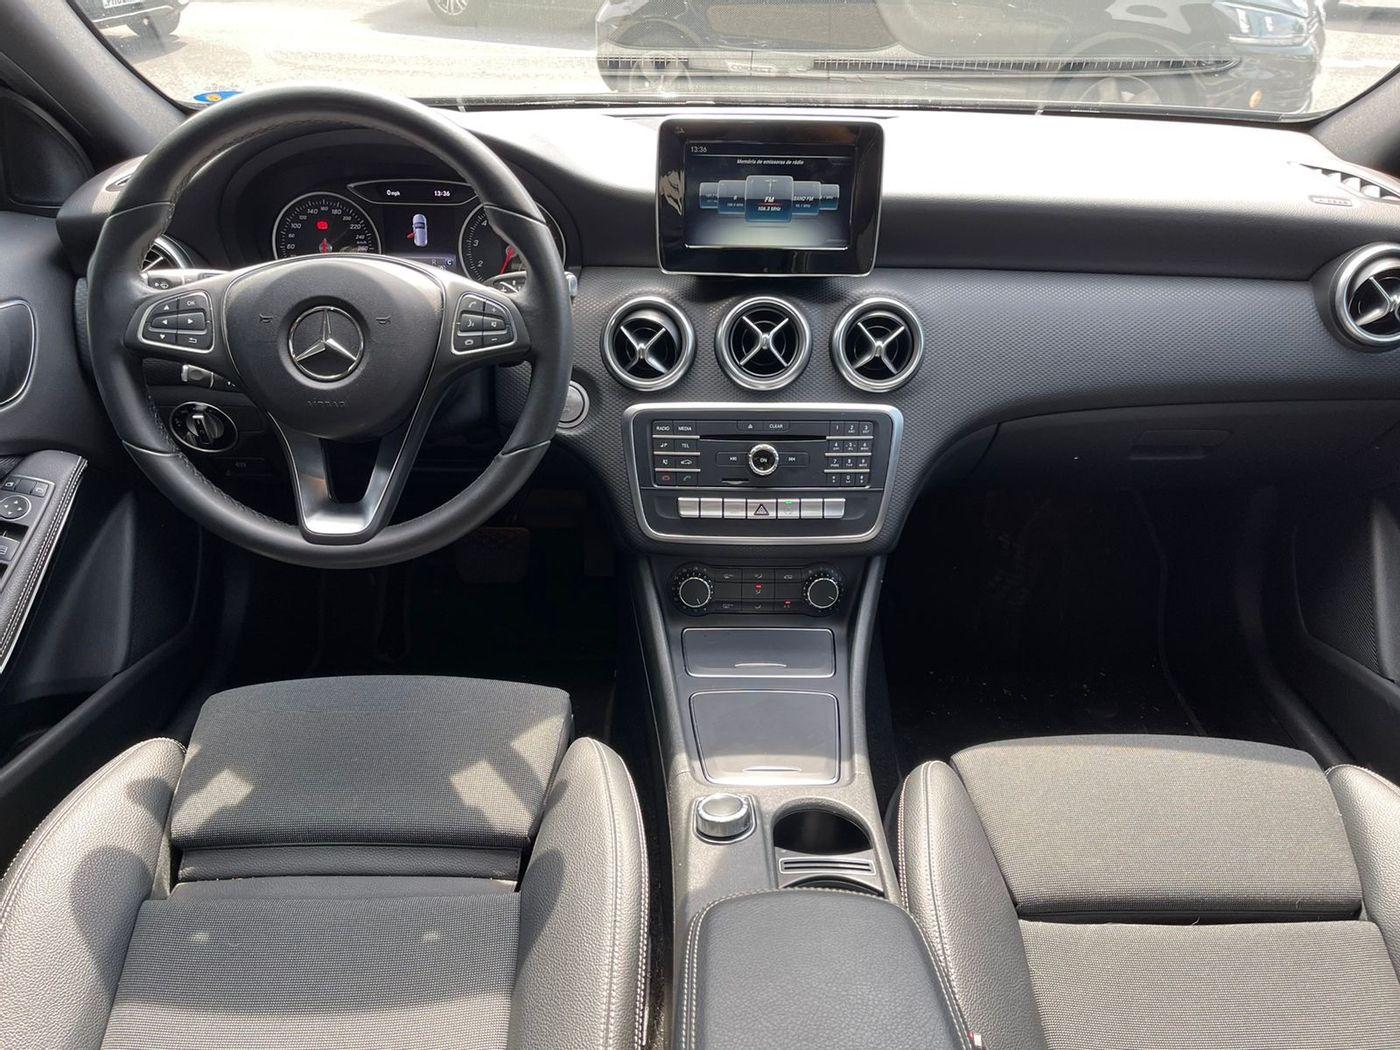 Mercedes Classe A 200 1.6 TB/Flex Aut.